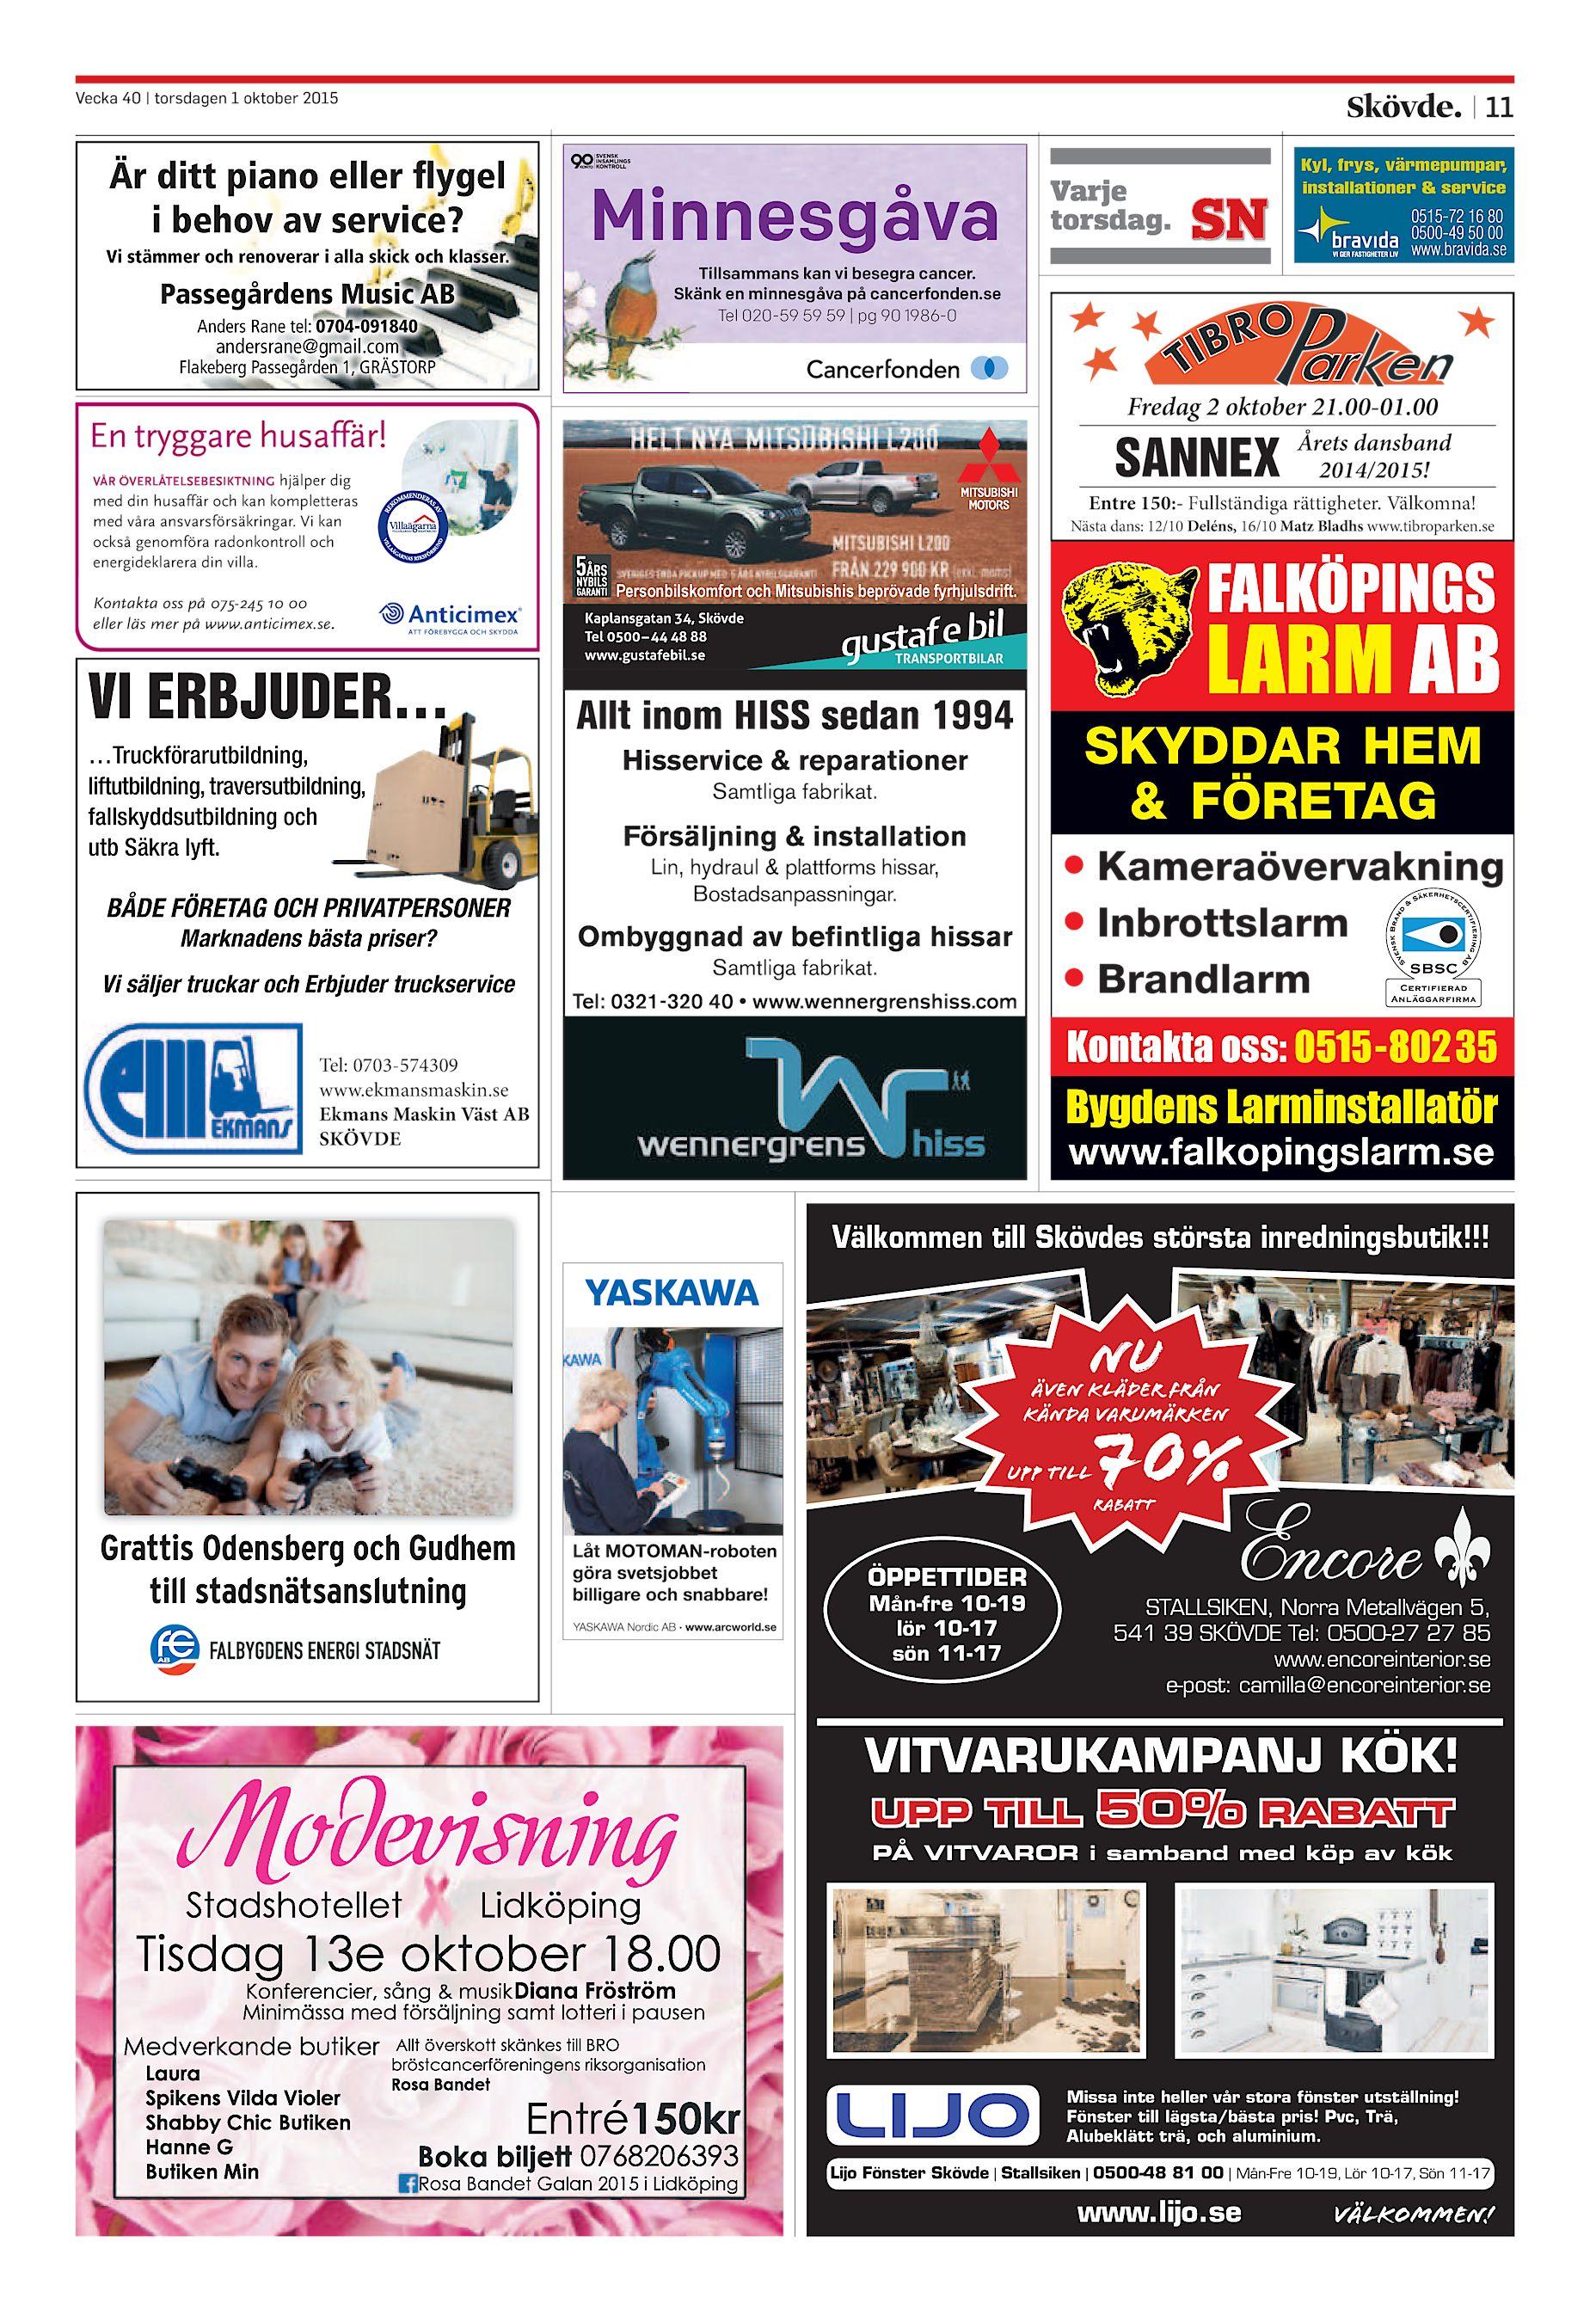 Skövde Nyheter SN-20151001 (endast text) 7b7e1d31520b4